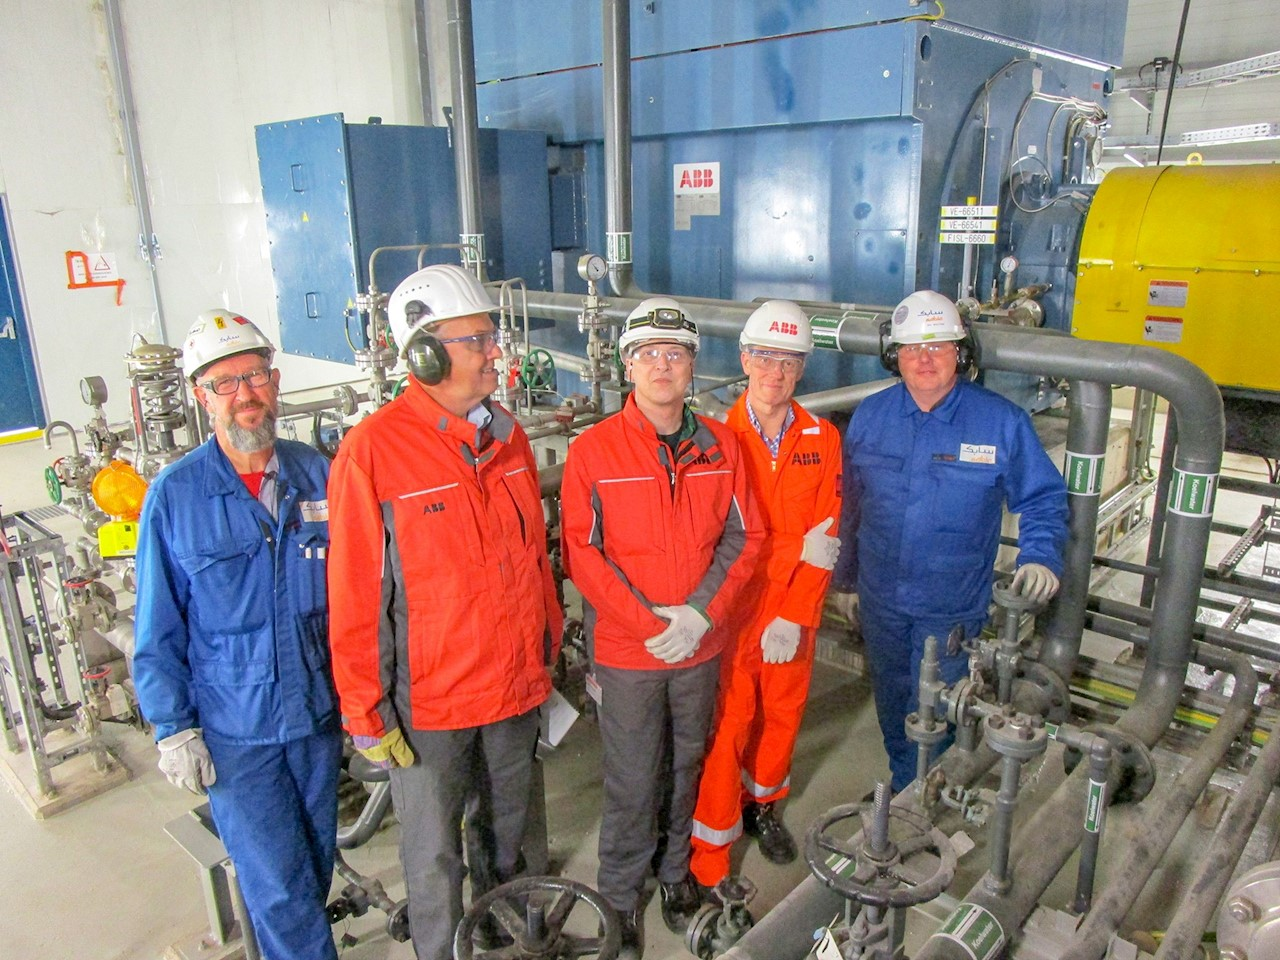 De gauche à droite : Roland Thijssen SABIC, Jan Post ABB, Danny Somford ABB, August Zaal ABB et Ivo Wouters SABIC